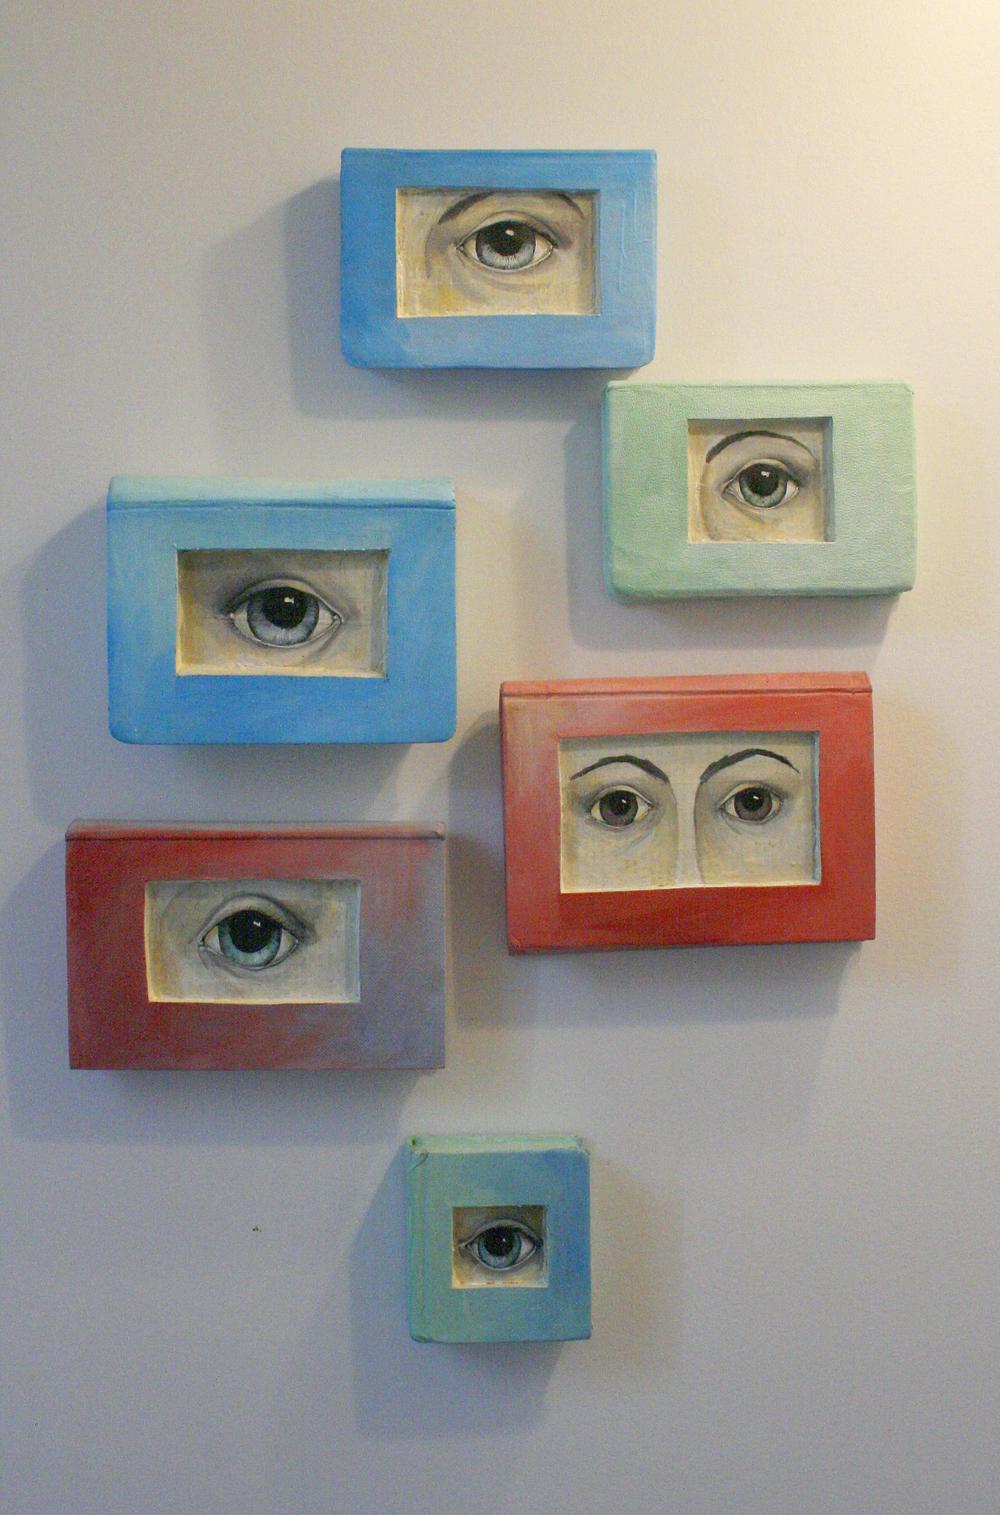 eye paintings on old books